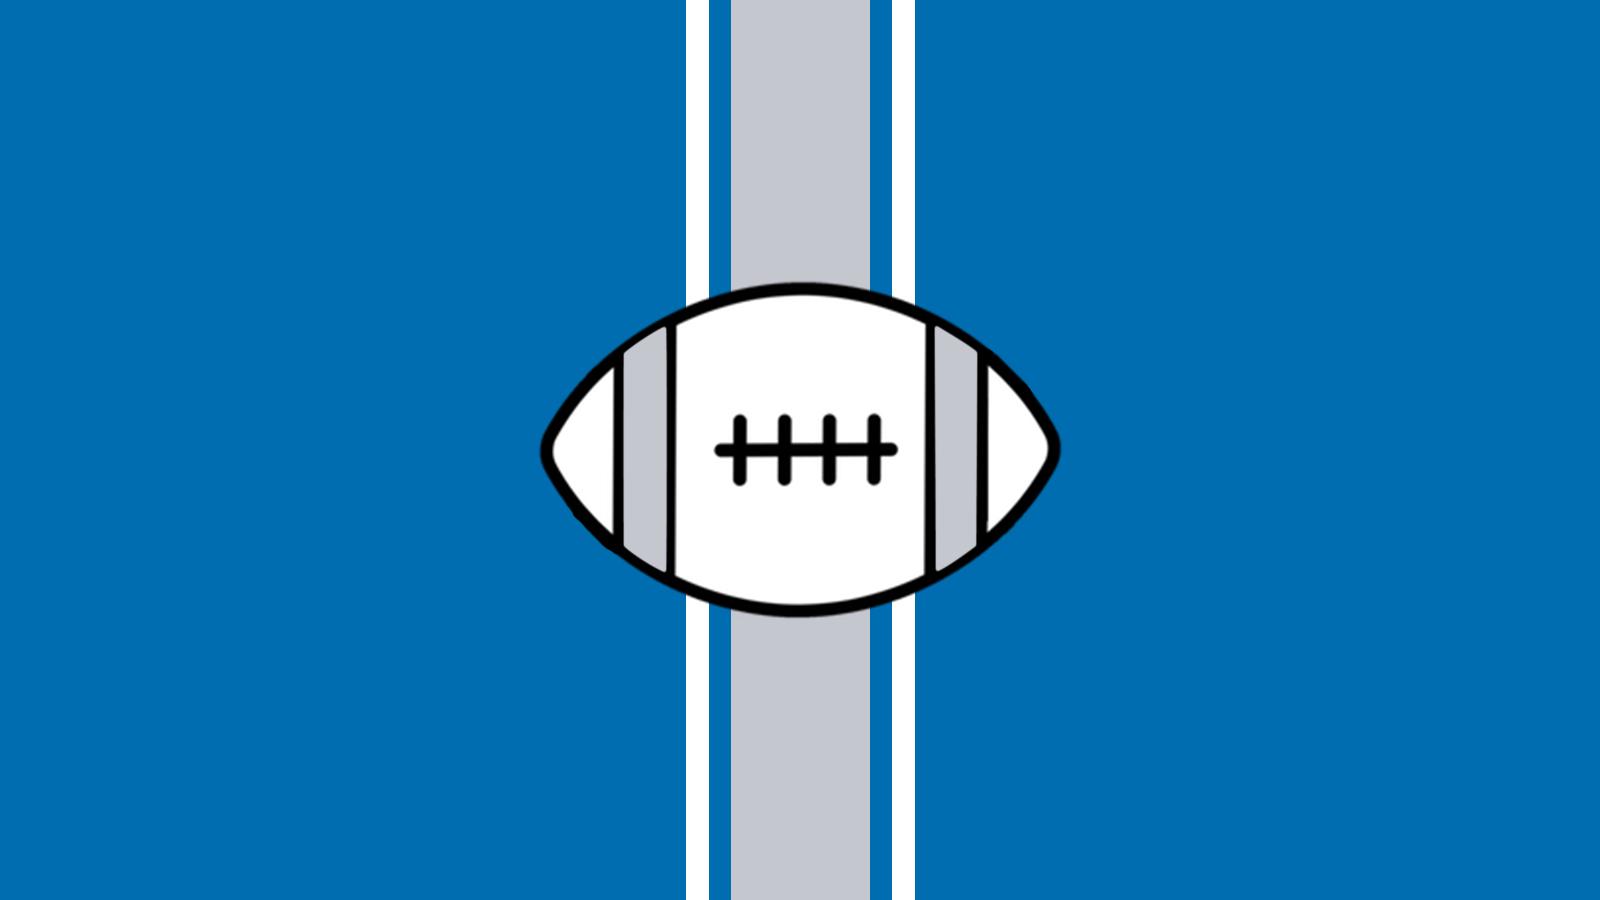 Detroit Lions Playoff Tickets